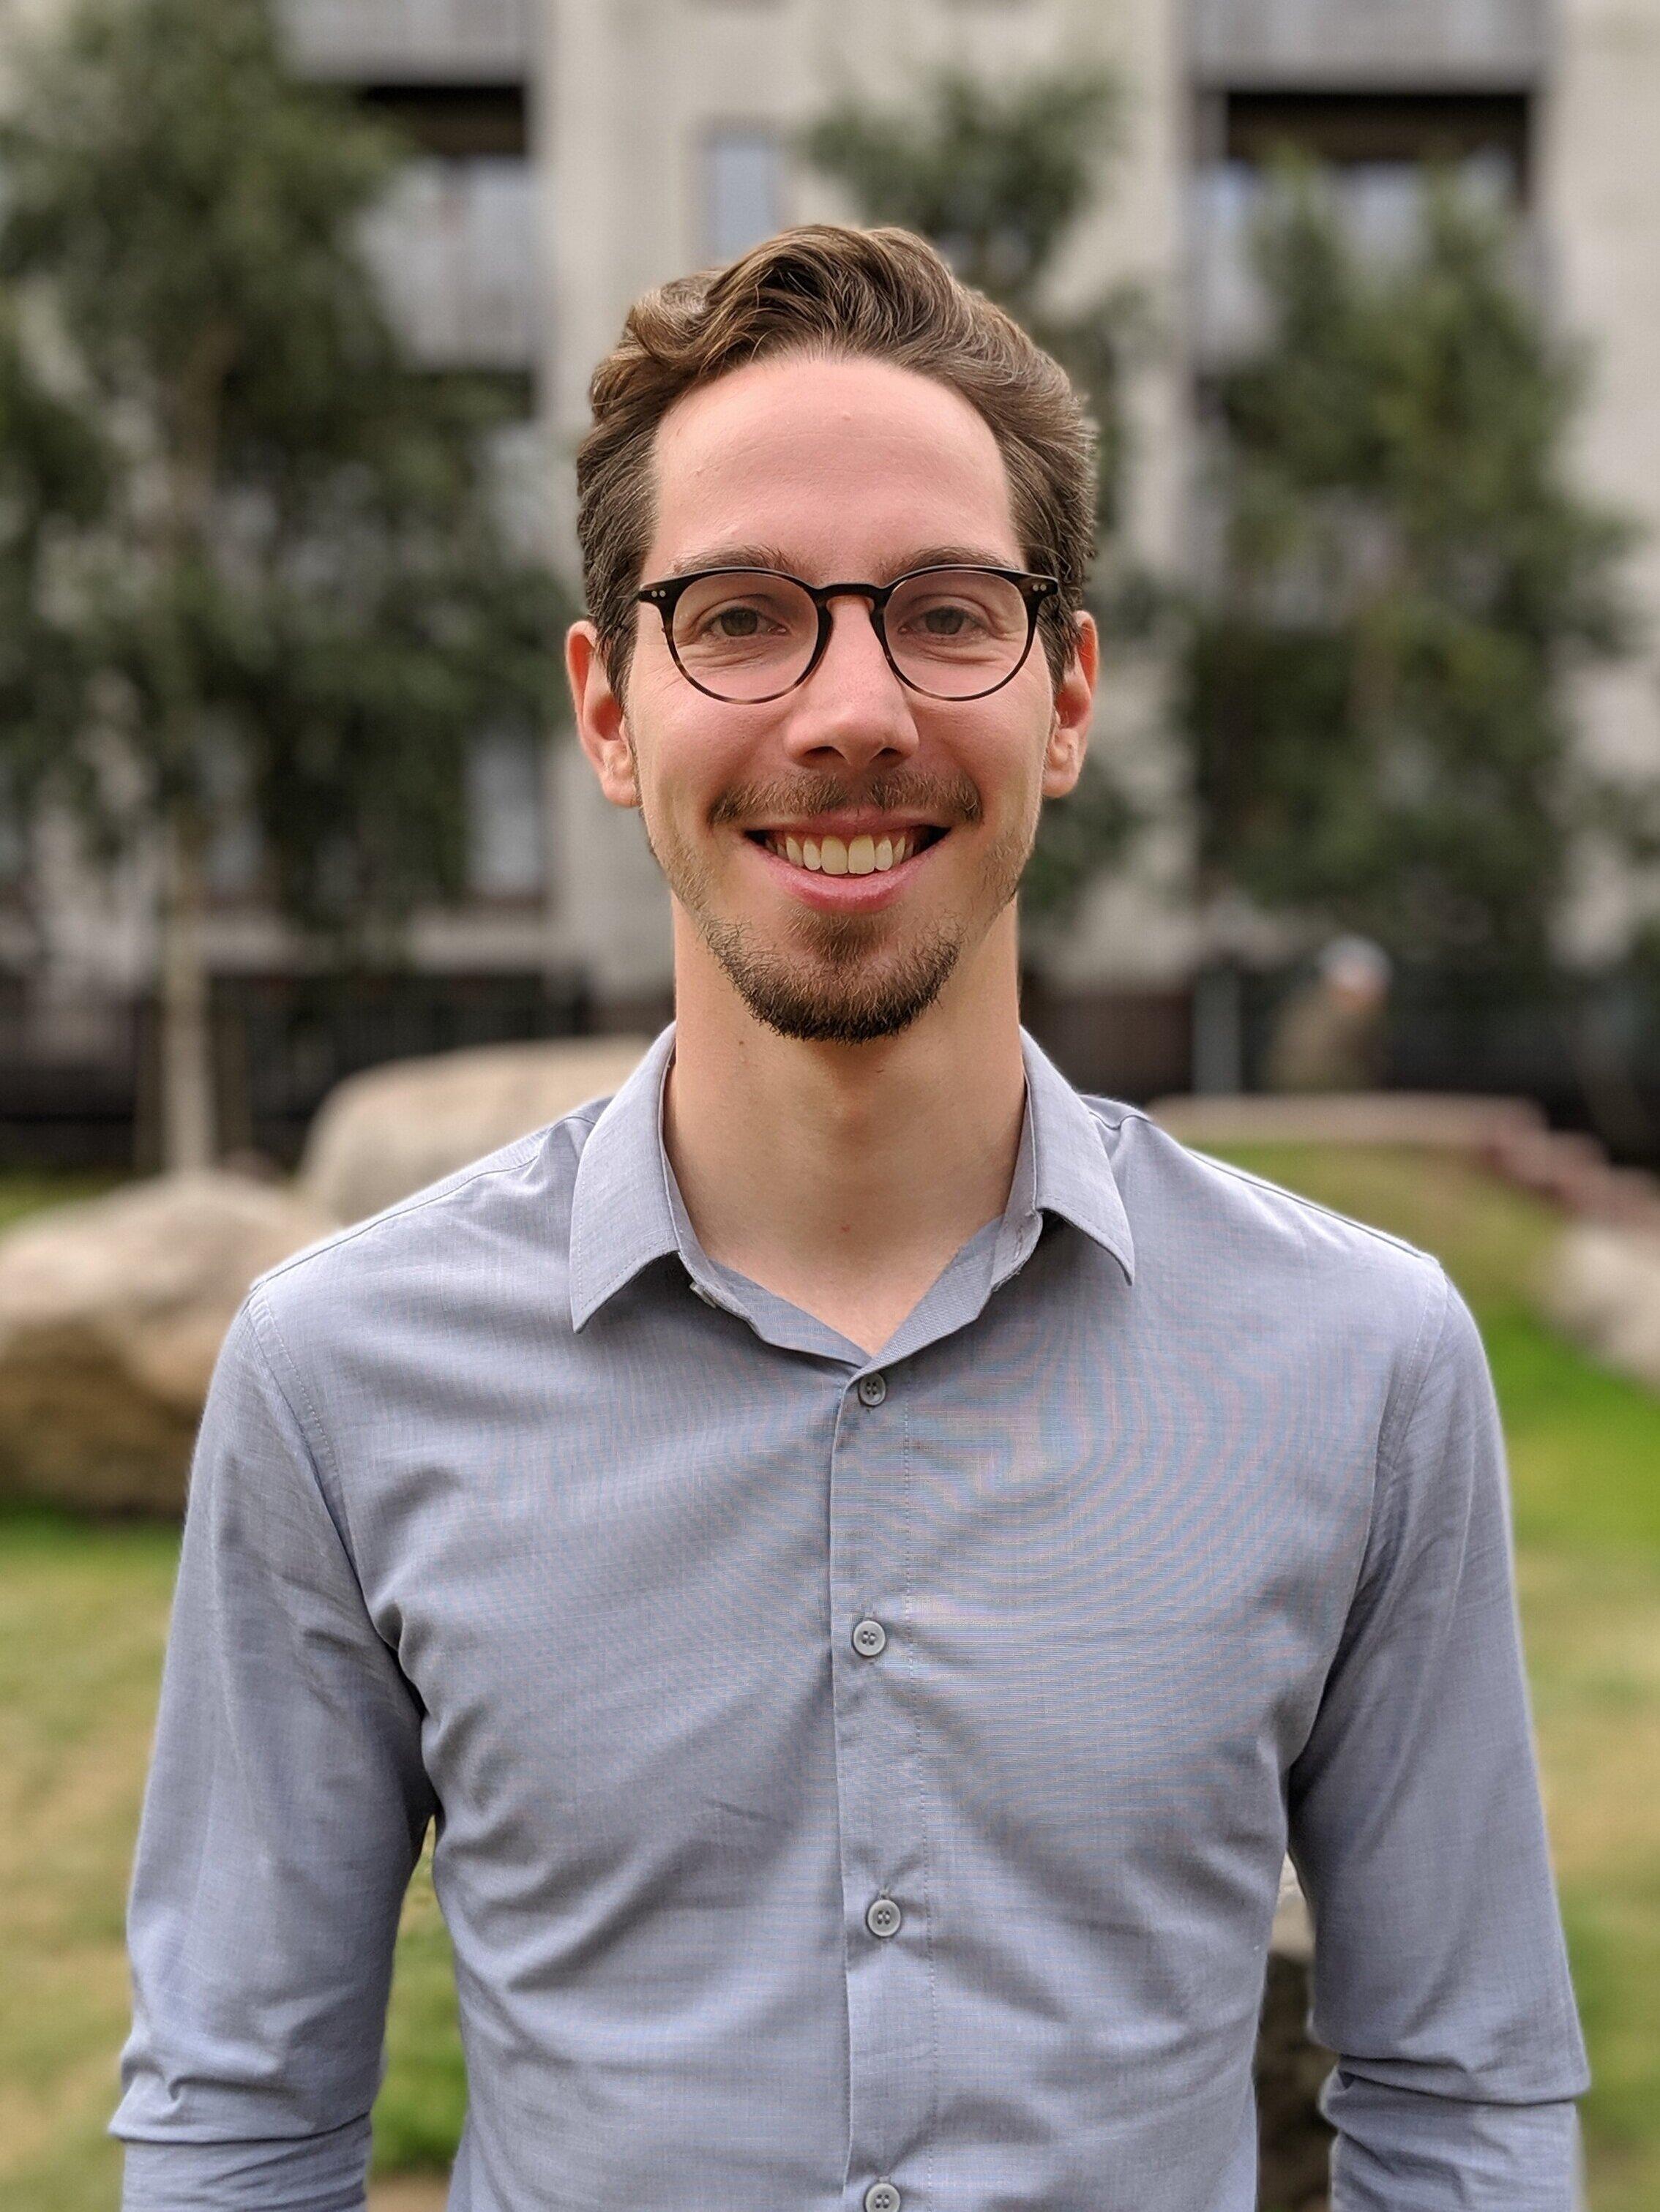 PETER RENNERTCTO, Co-Founder -